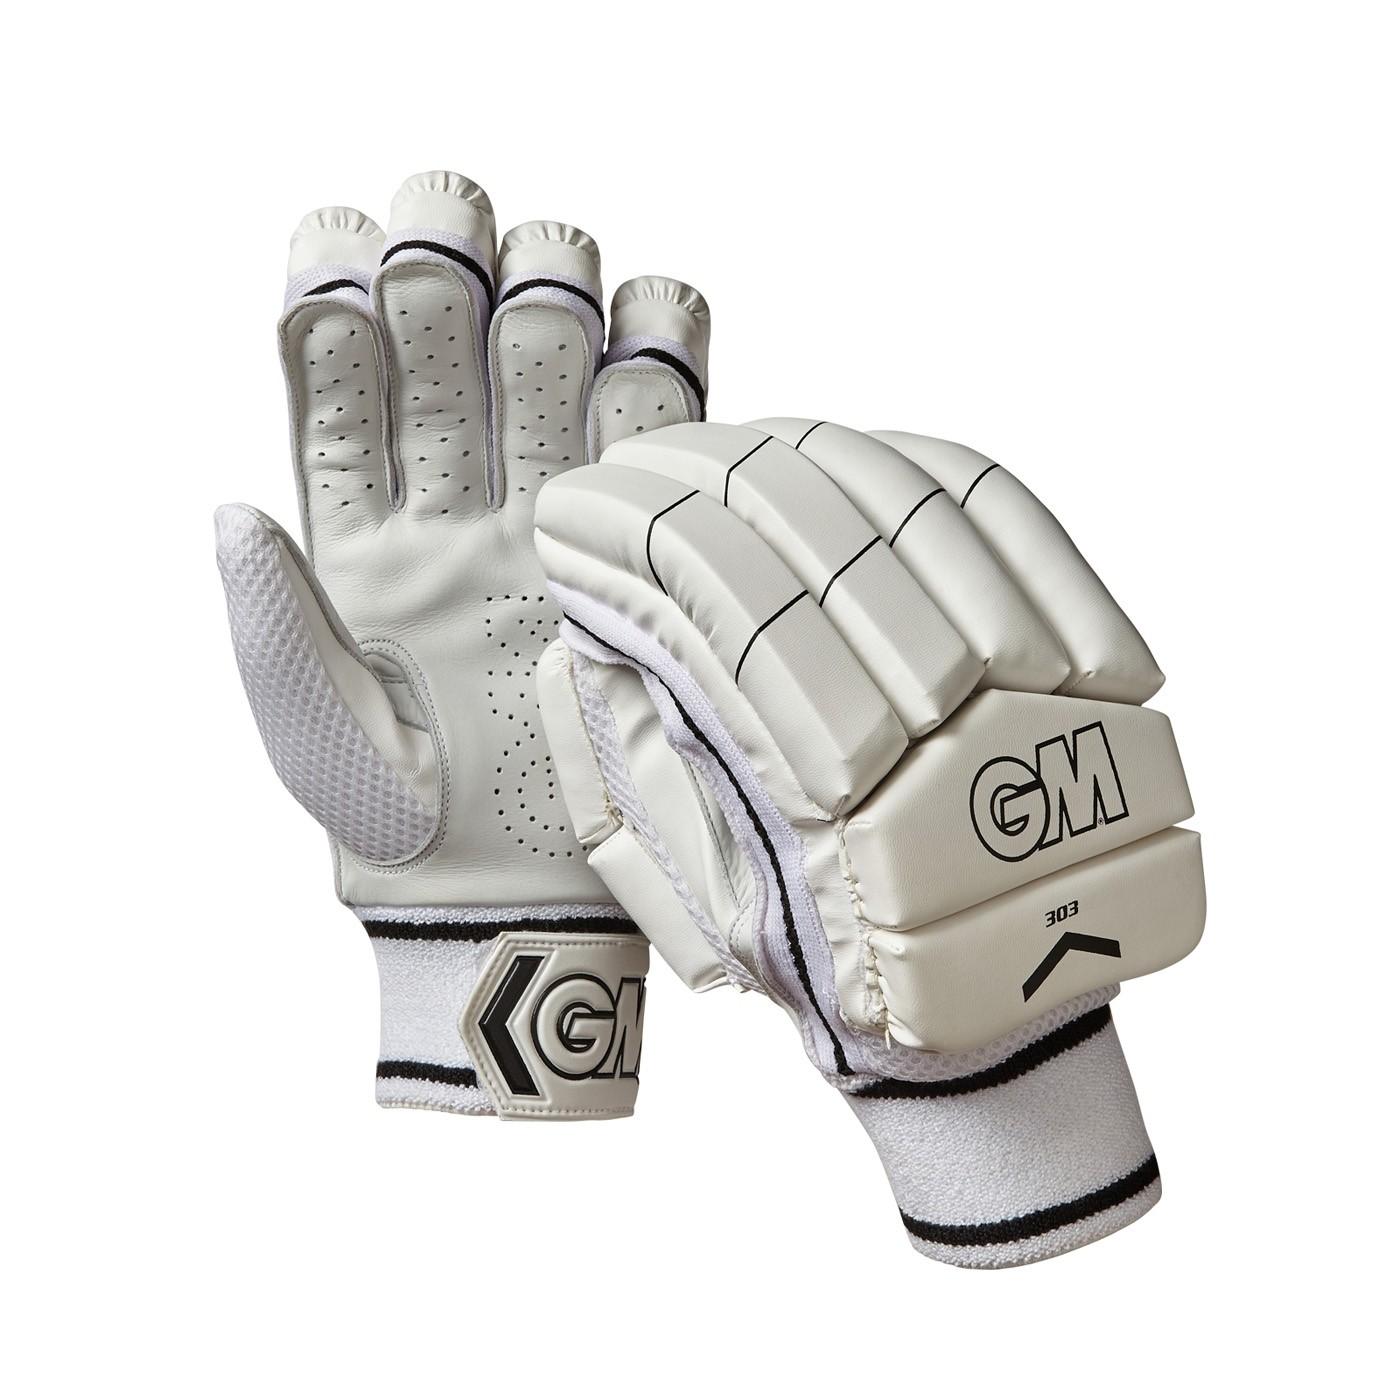 2021 Gunn and Moore 303 Batting Gloves